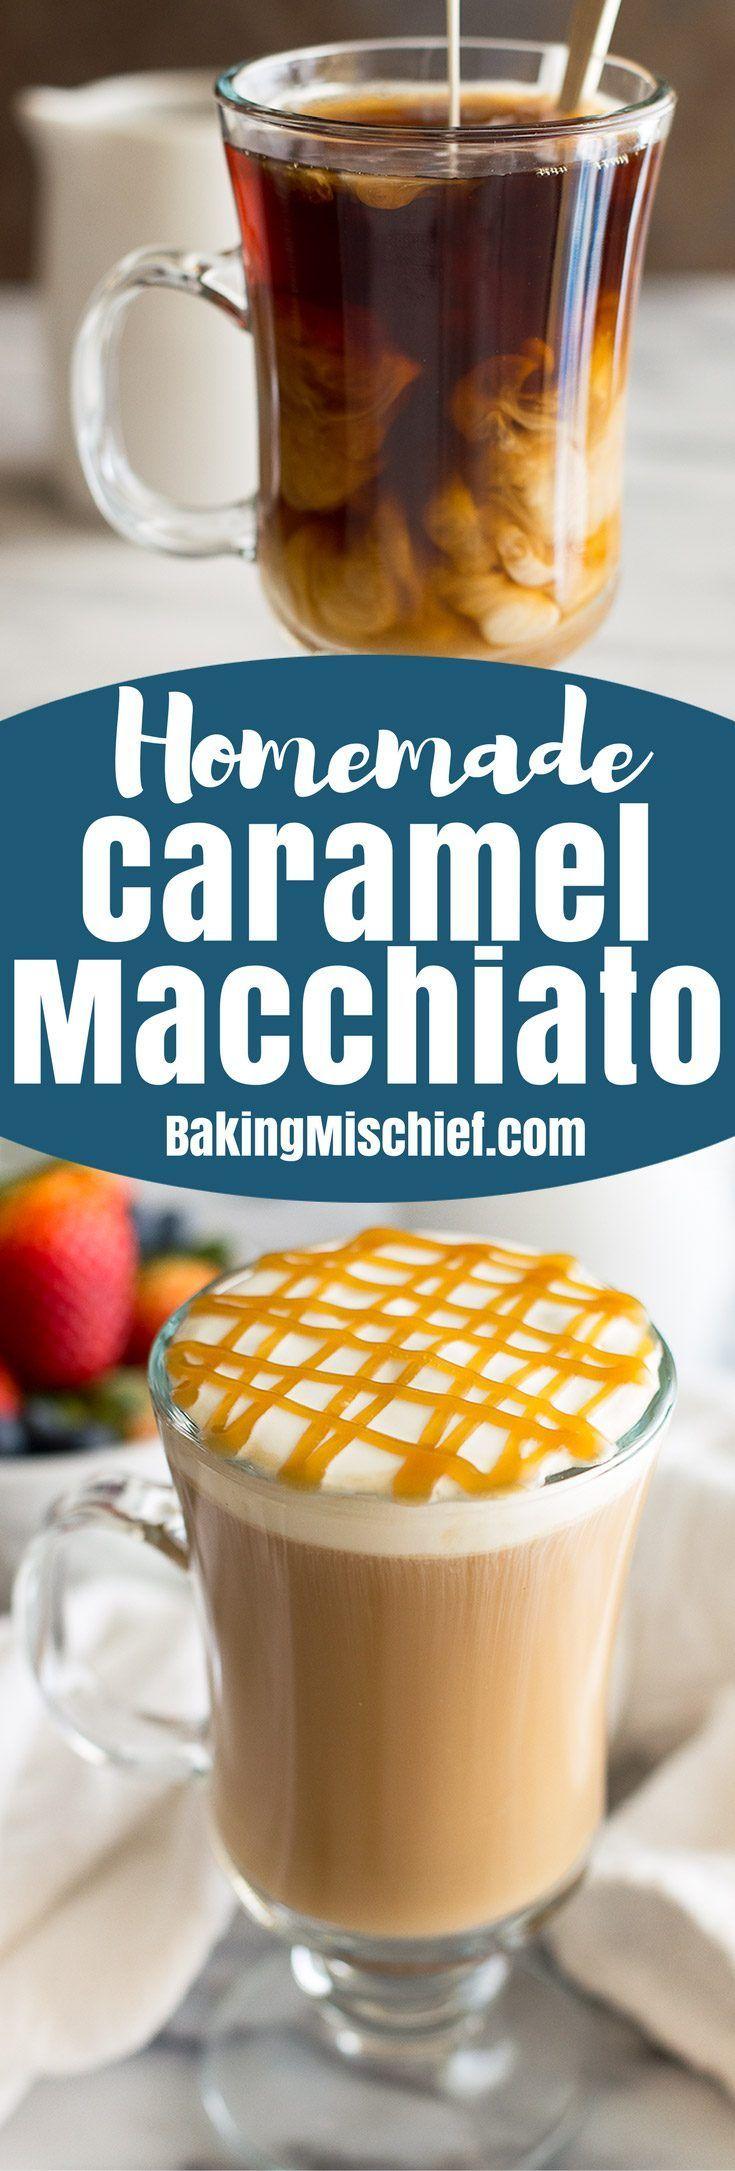 A homemade copycat recipe for Starbucks' caramel macchiato, but better! From http://BakingMischief.com